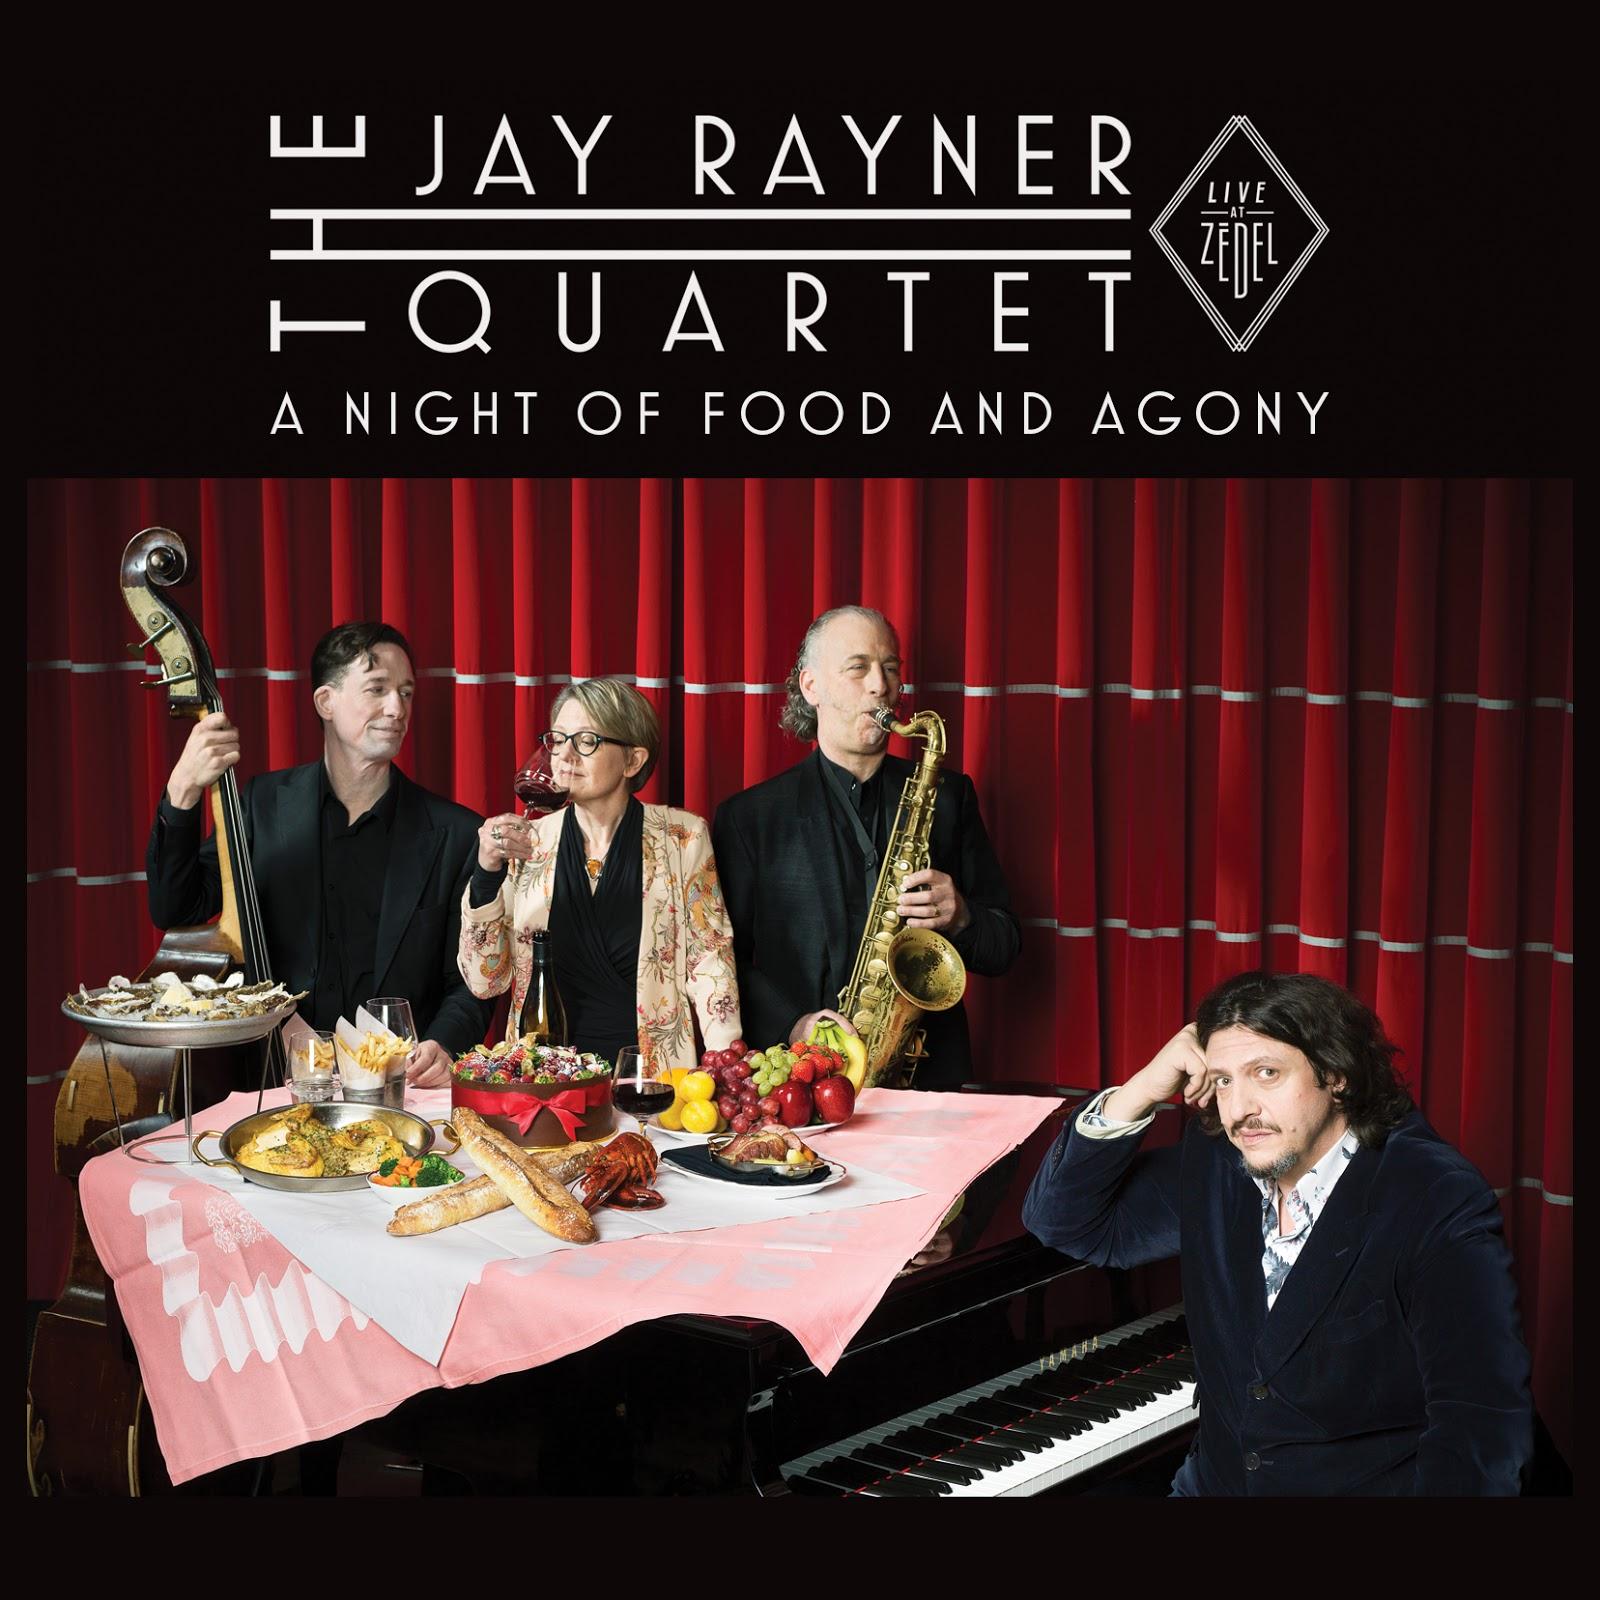 LondonJazz: CD REVIEW: Jay Rayner Quartet